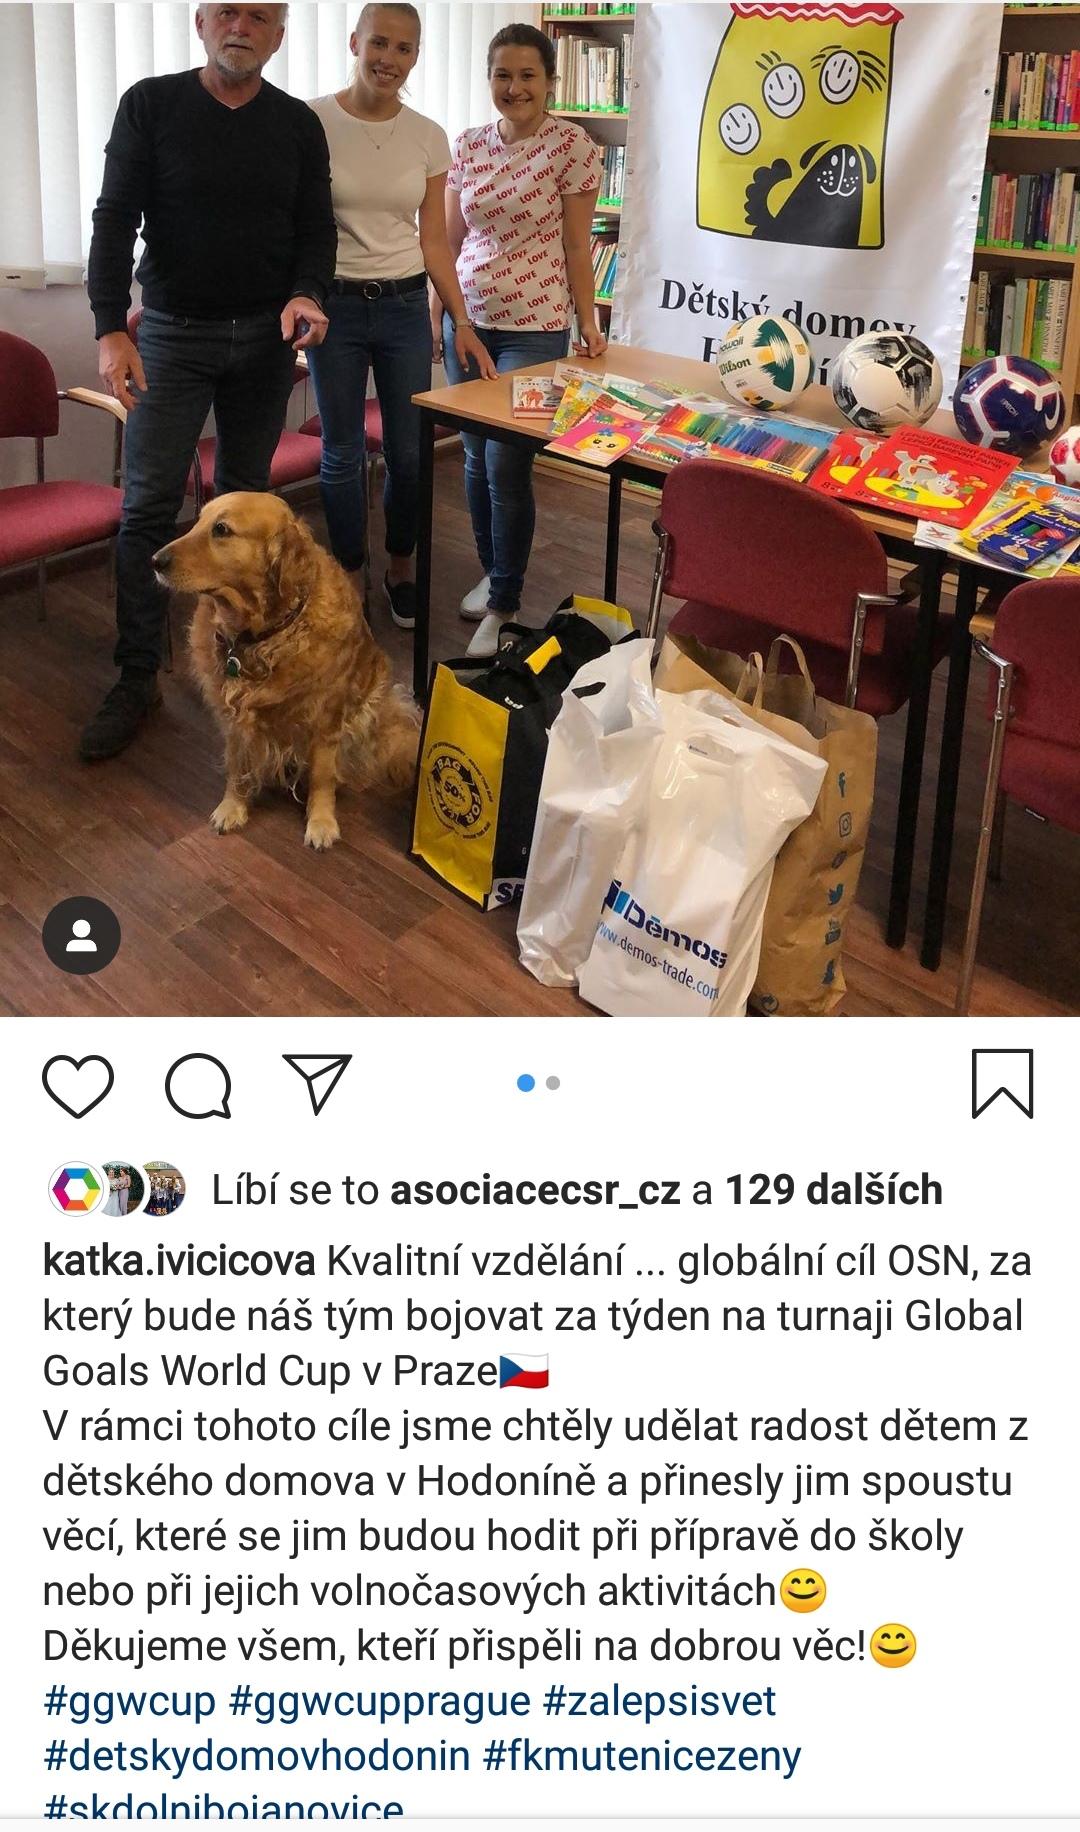 GGWCup Prague 2019 IMG_20190524_152159.jpg